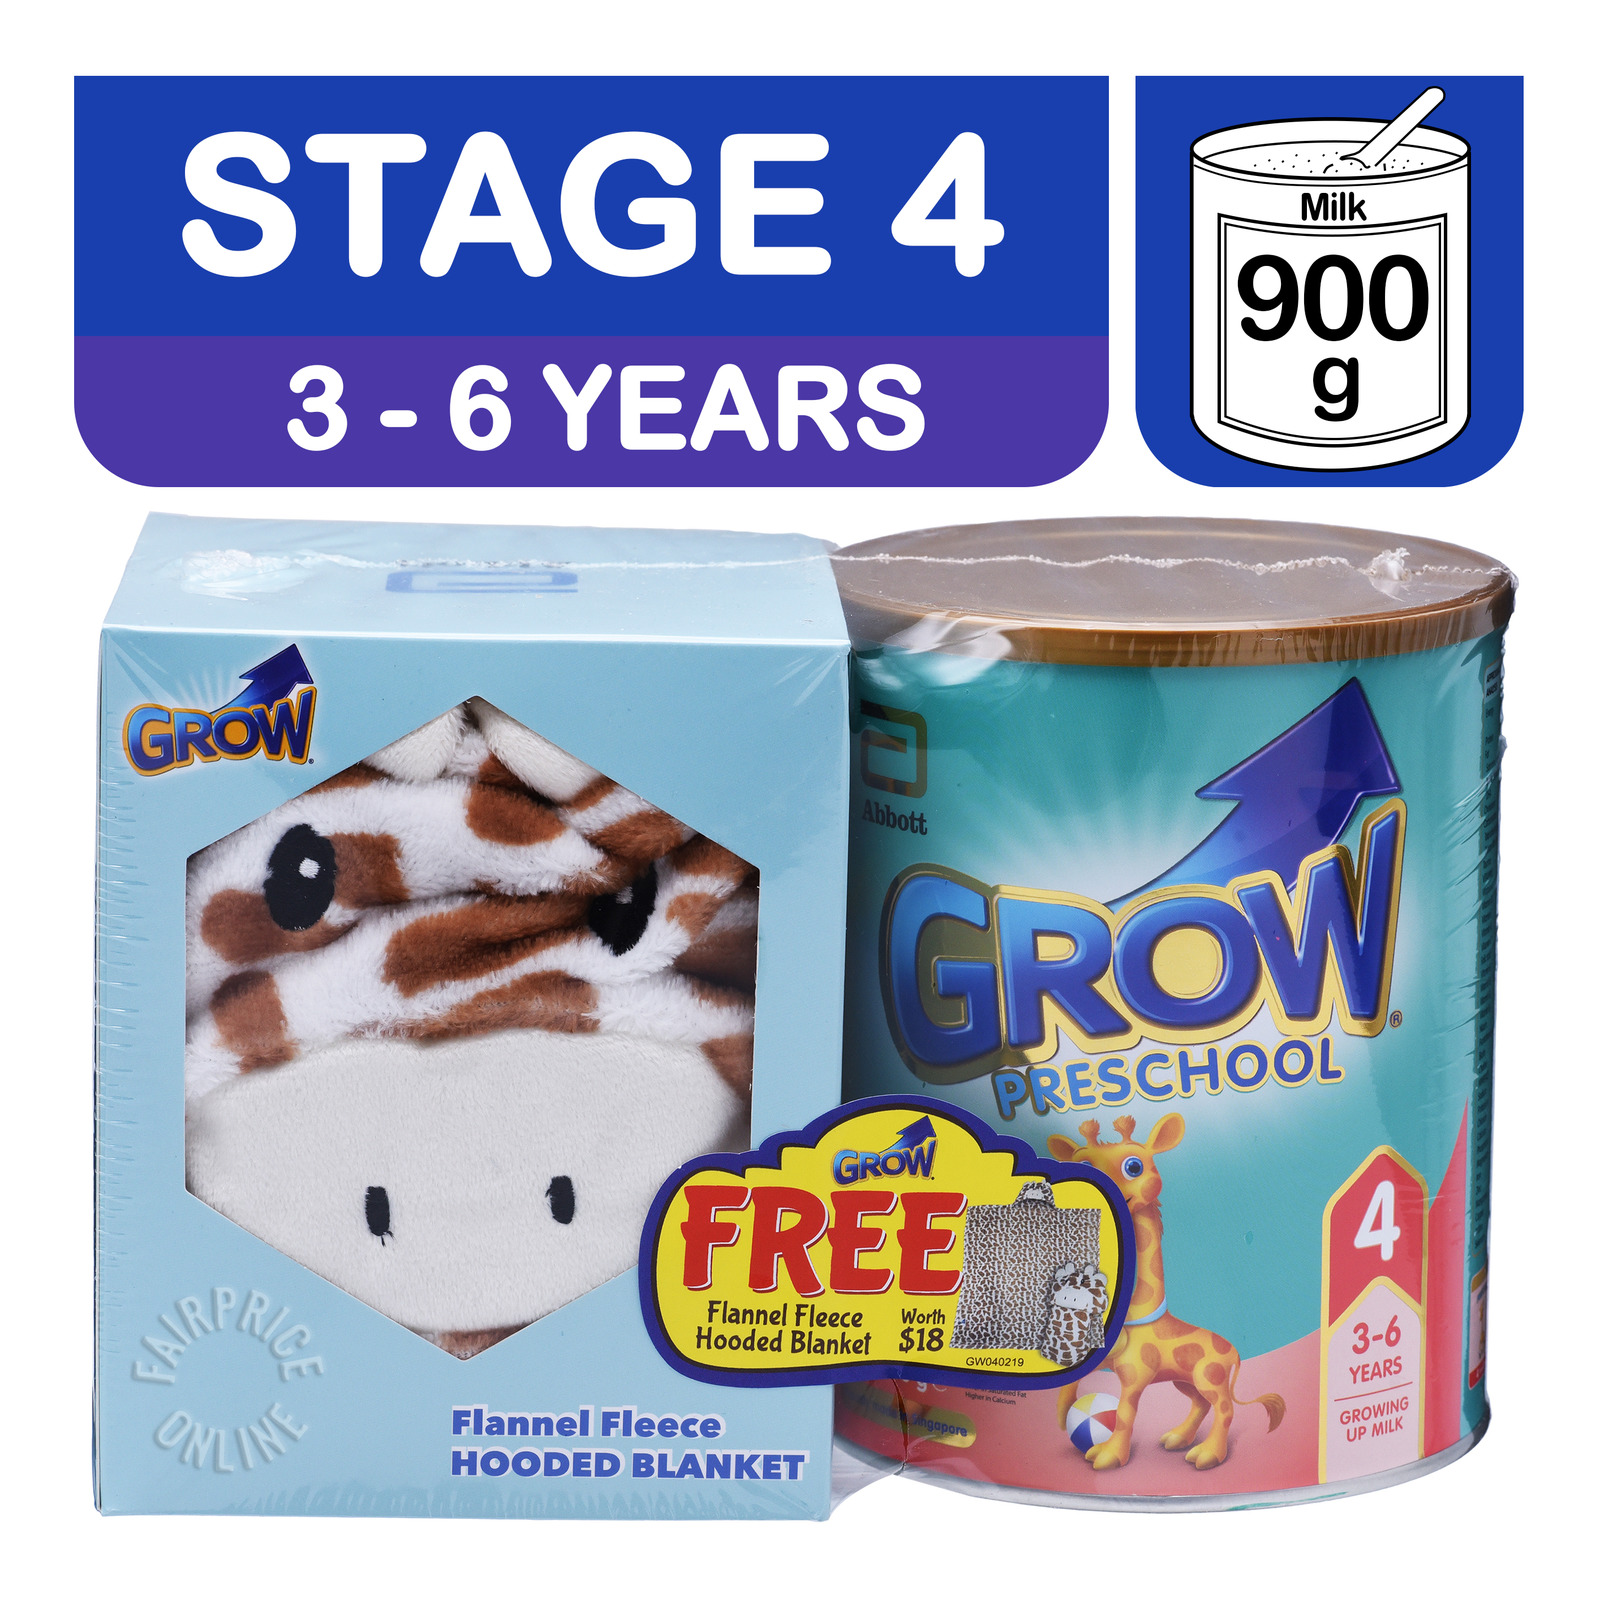 Abbott Grow Preschool Milk Formula - 3 Years + Hooded Blanket